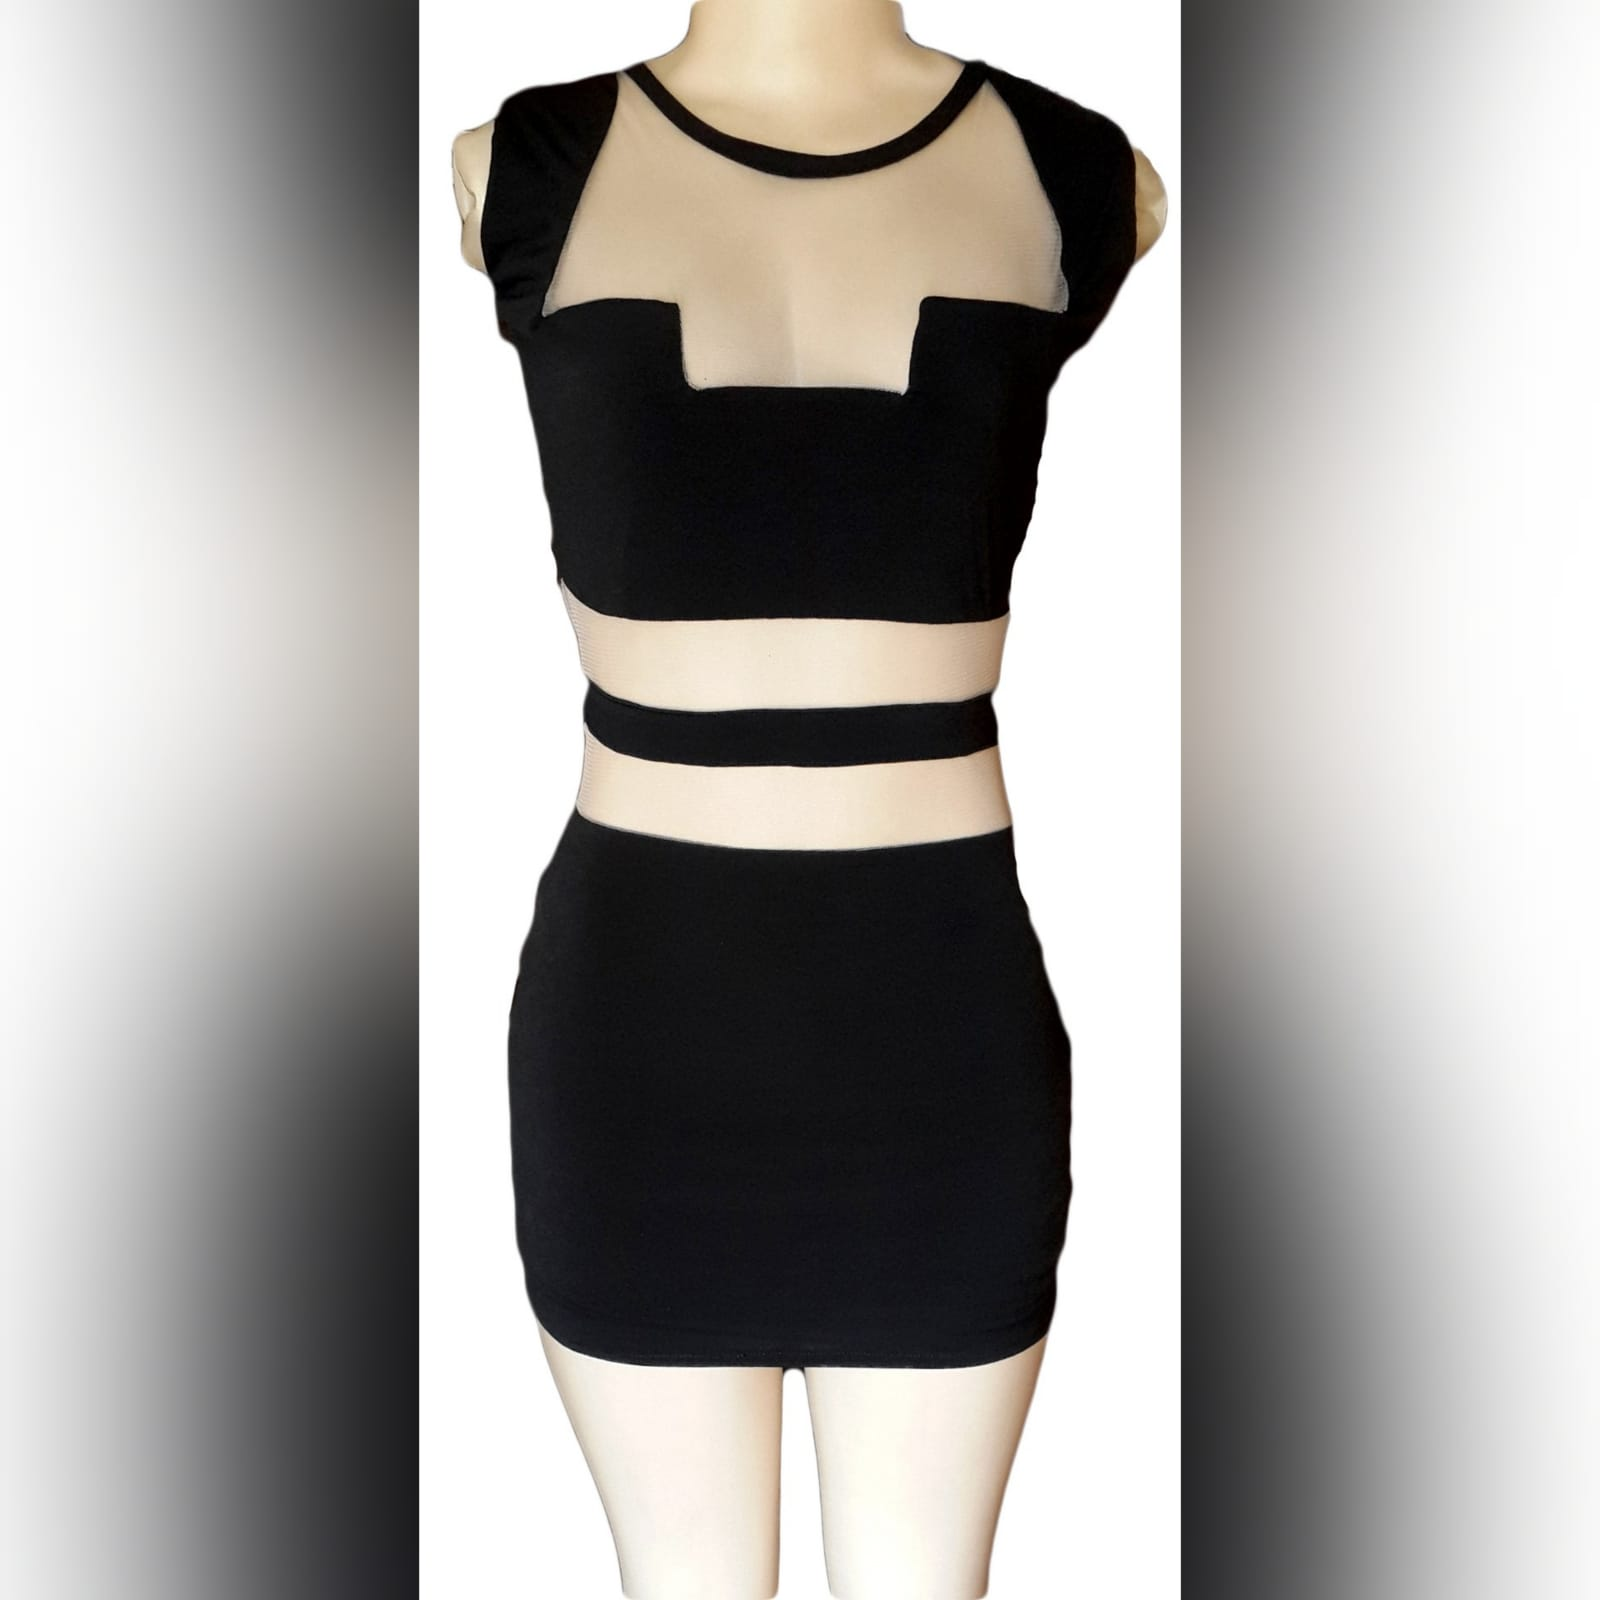 Mini black smart casual dress 1 mini black smart casual dress with see through tummy design and funky neckline